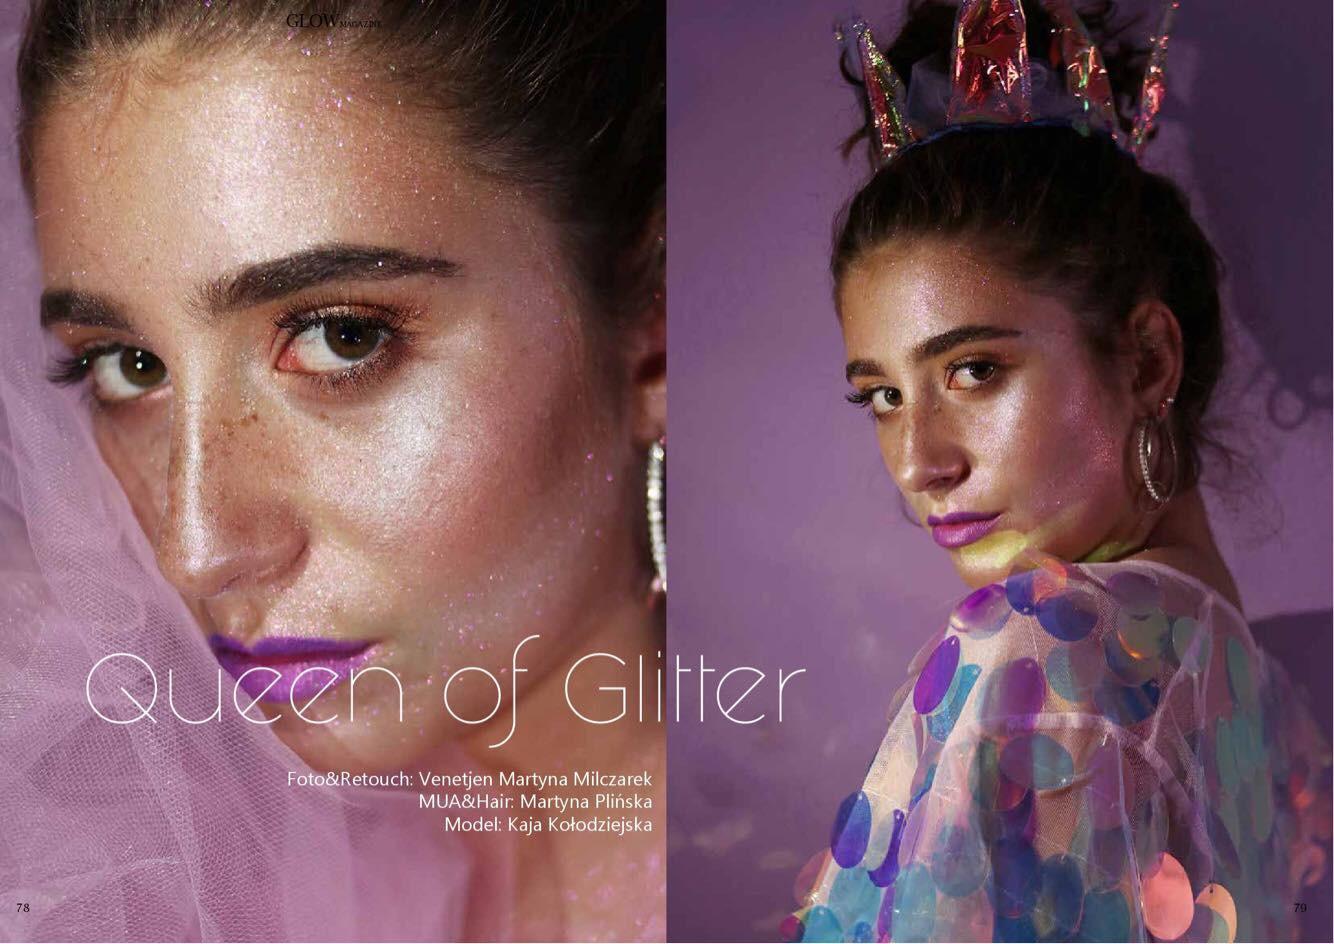 Queen of glitter